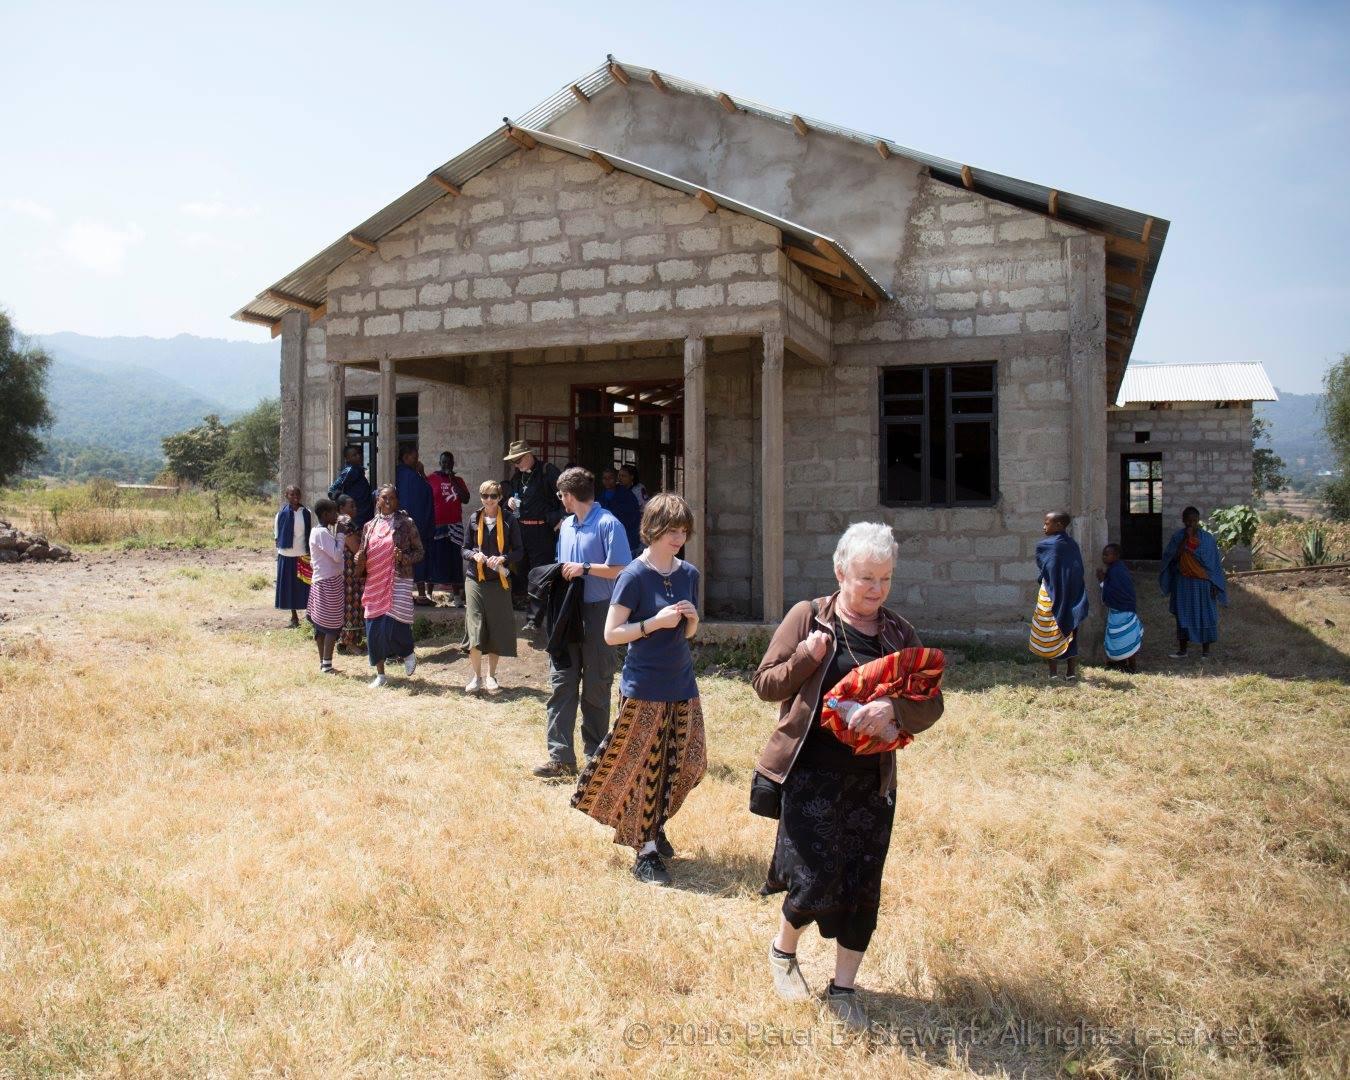 Cross of Christ Lutheran Church Tanzania Mission Team, 2016